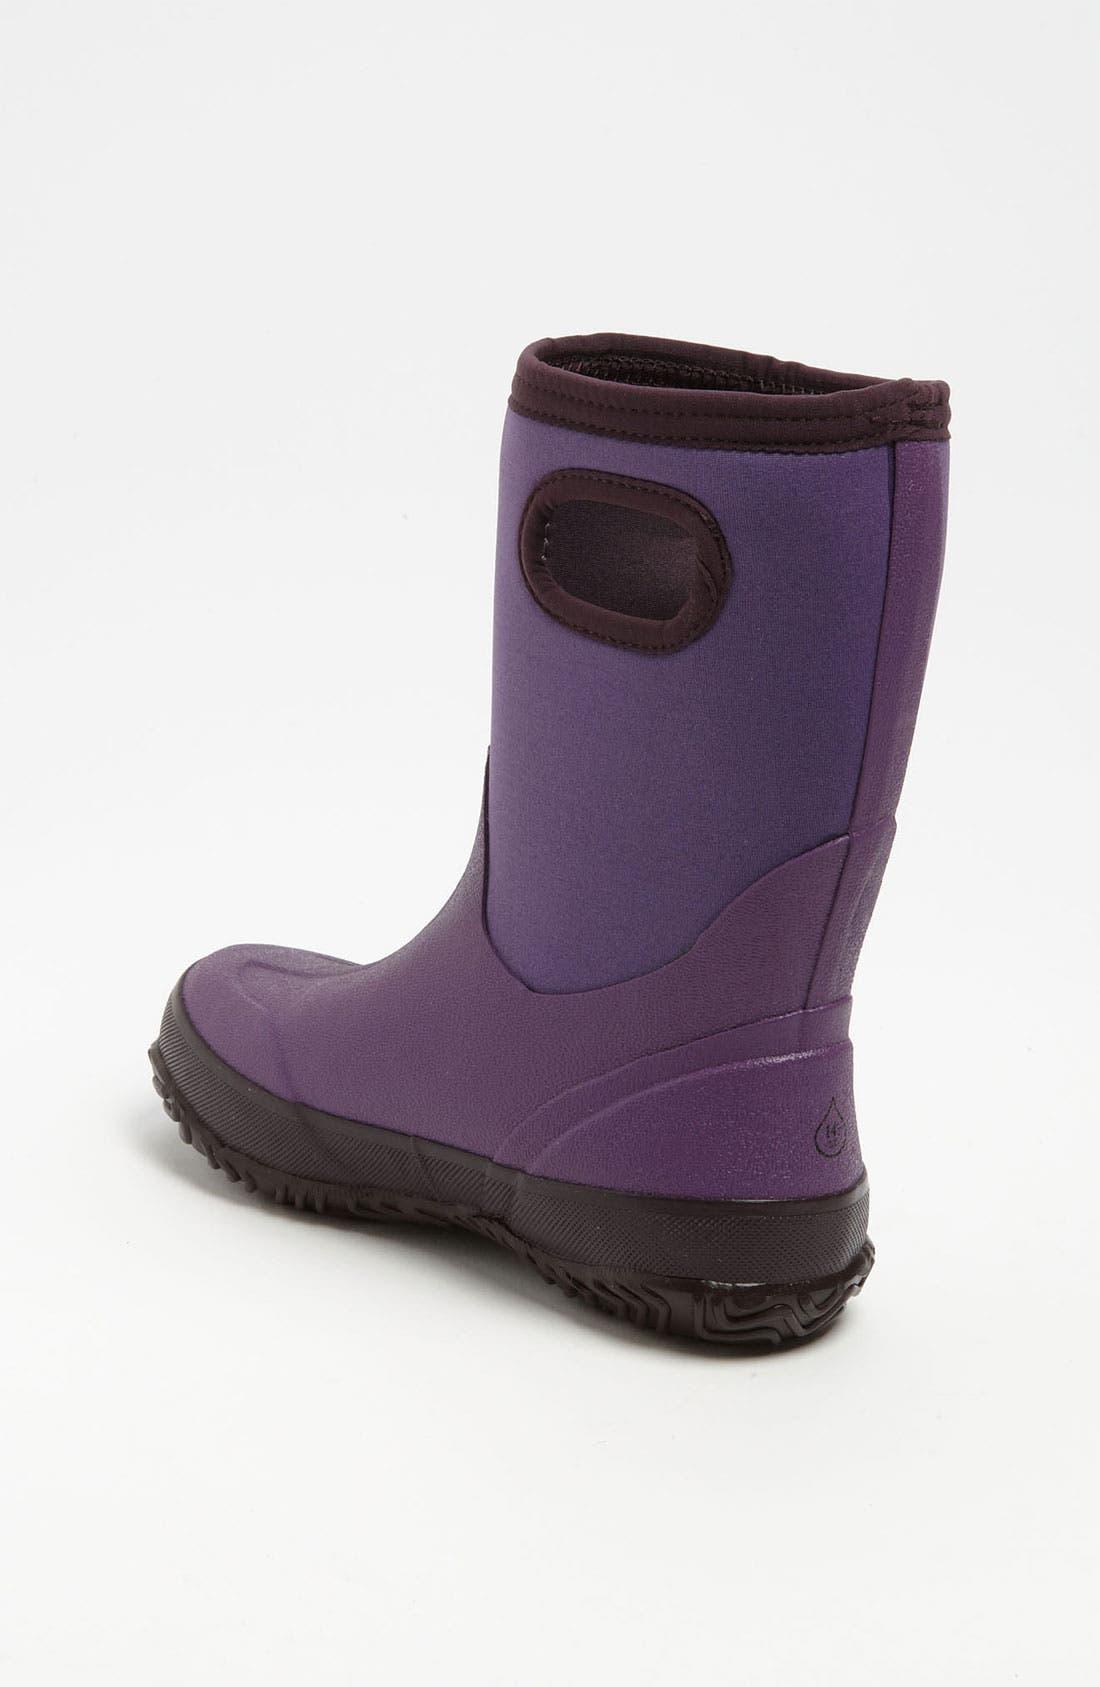 Alternate Image 2  - Bogs 'Glosh' Rain Boot (Toddler, Little Kid & Big Kid)